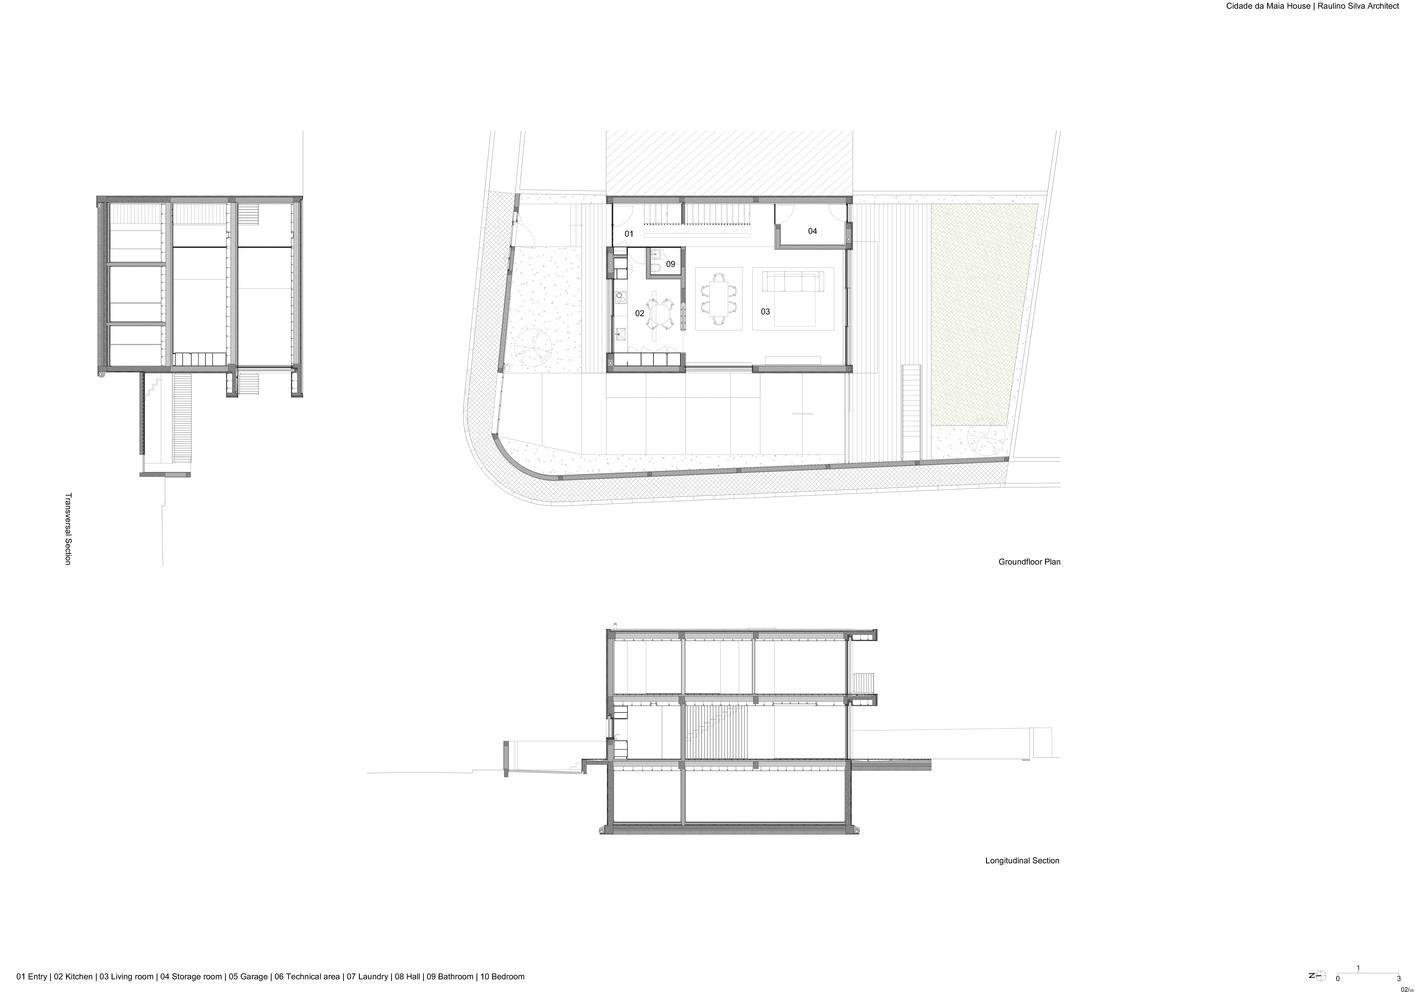 Gallery Of Maia House Raulino Silva Arquitecto 28